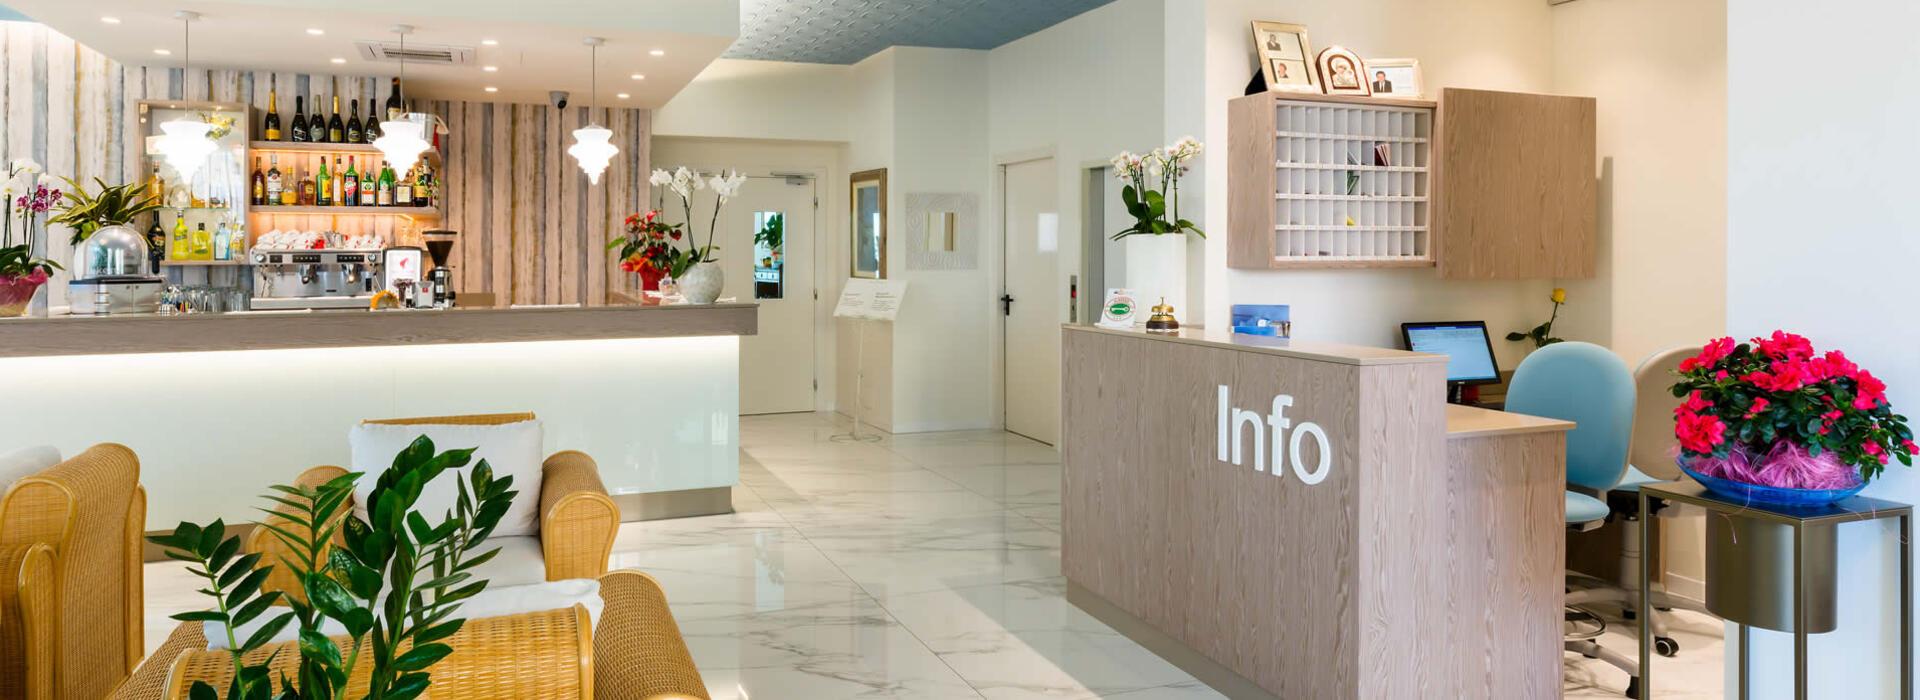 hotelvictoria ru gourmet 015